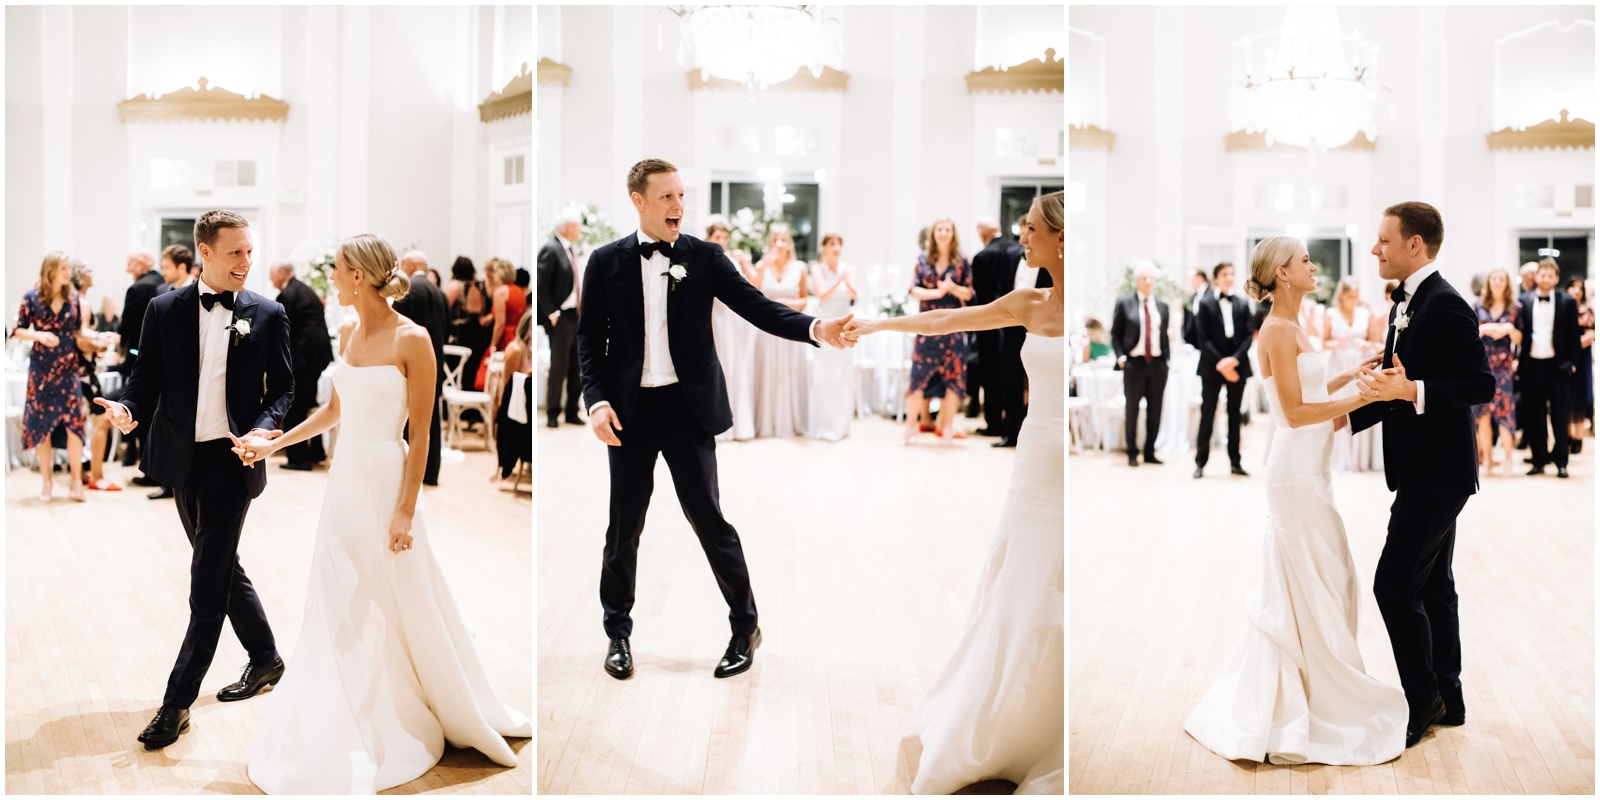 Minnesota Wedding Planner. Lafayette Club Wedding. Wedding Reception Inspiration. Wedding Decor. Greenery Wedding